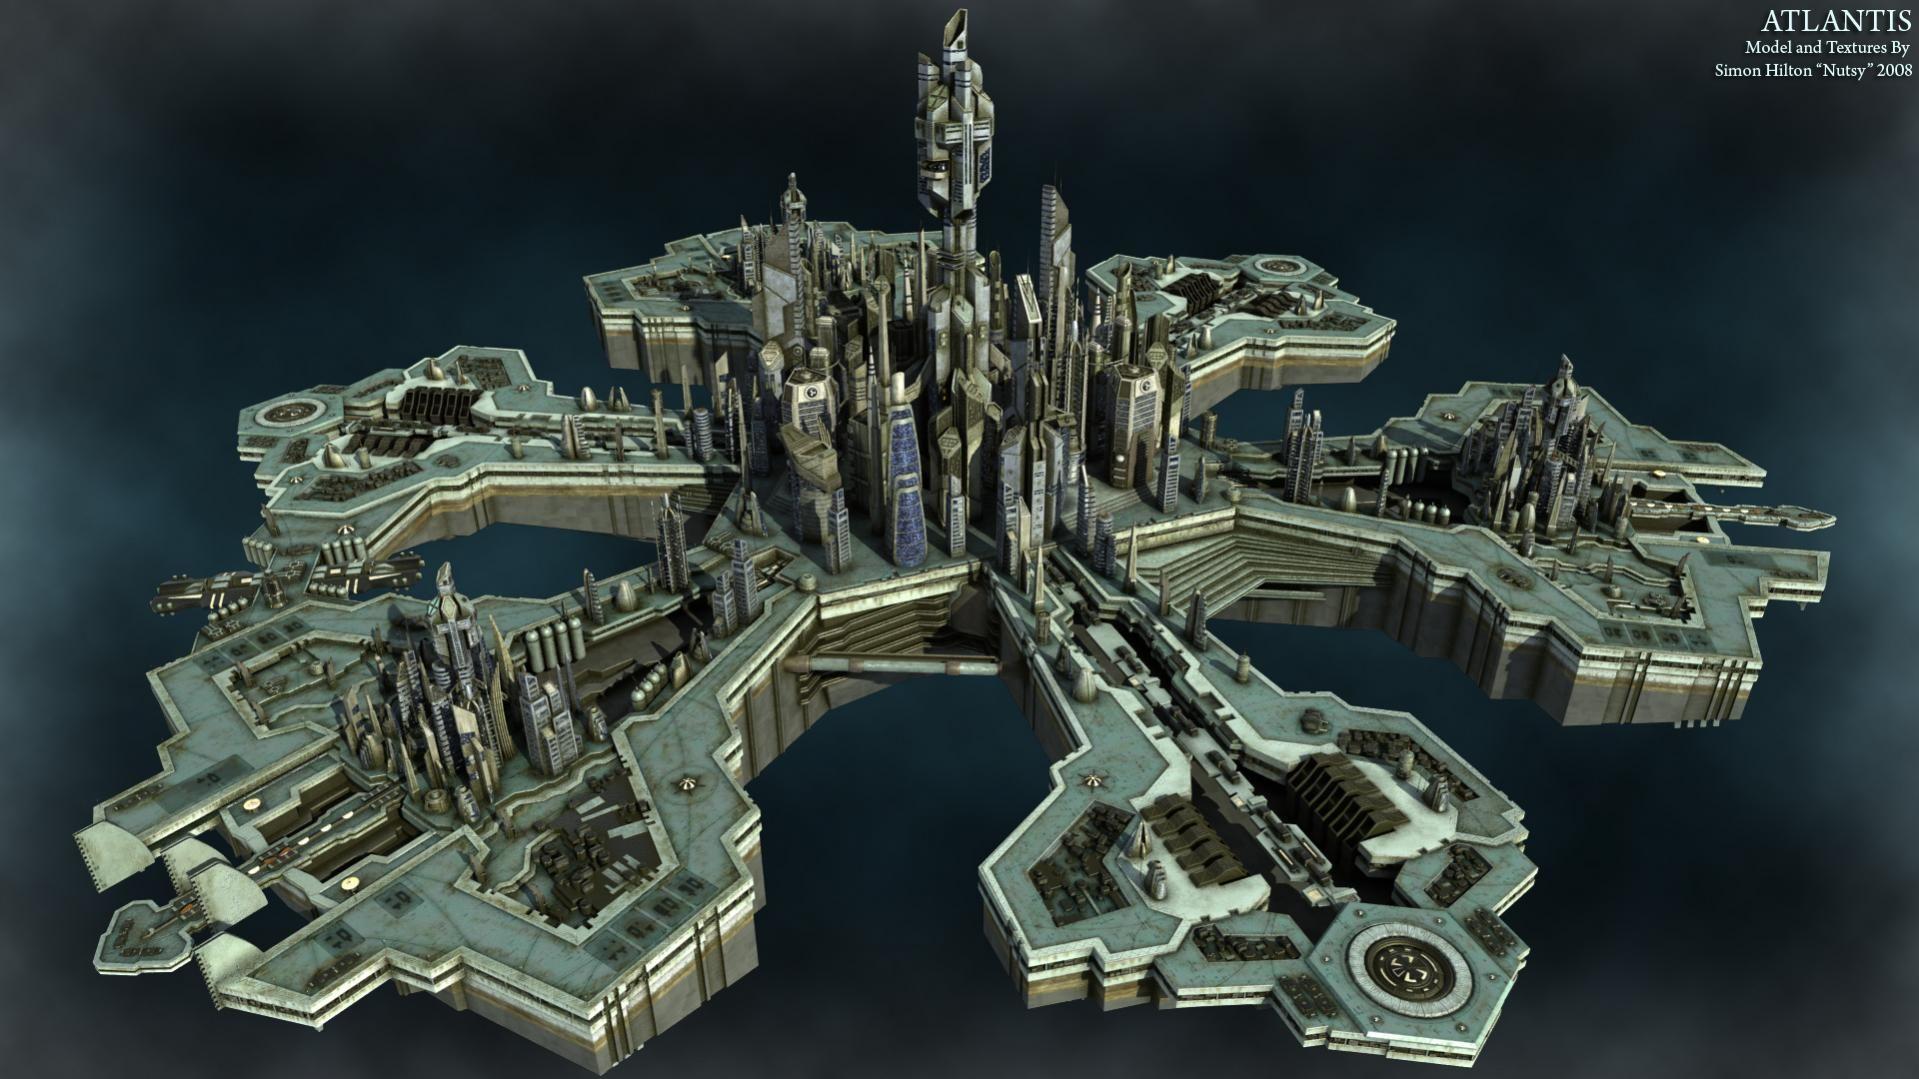 Pin by Blue Paian on Stargate CGI   Stargate, Sci fi, Atlantis